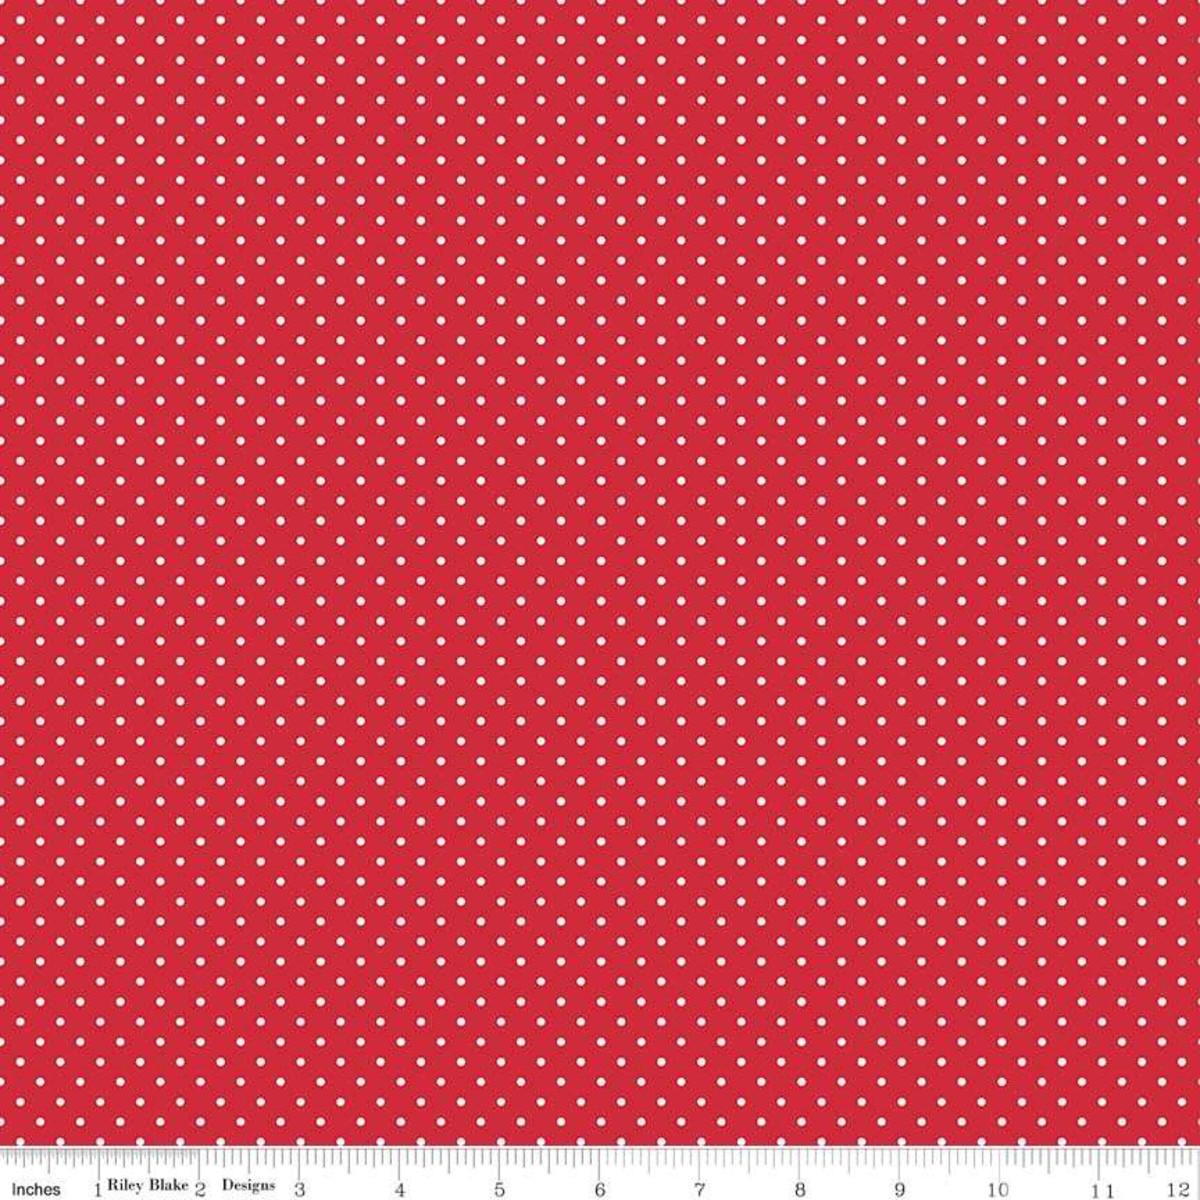 Swiss dot - red